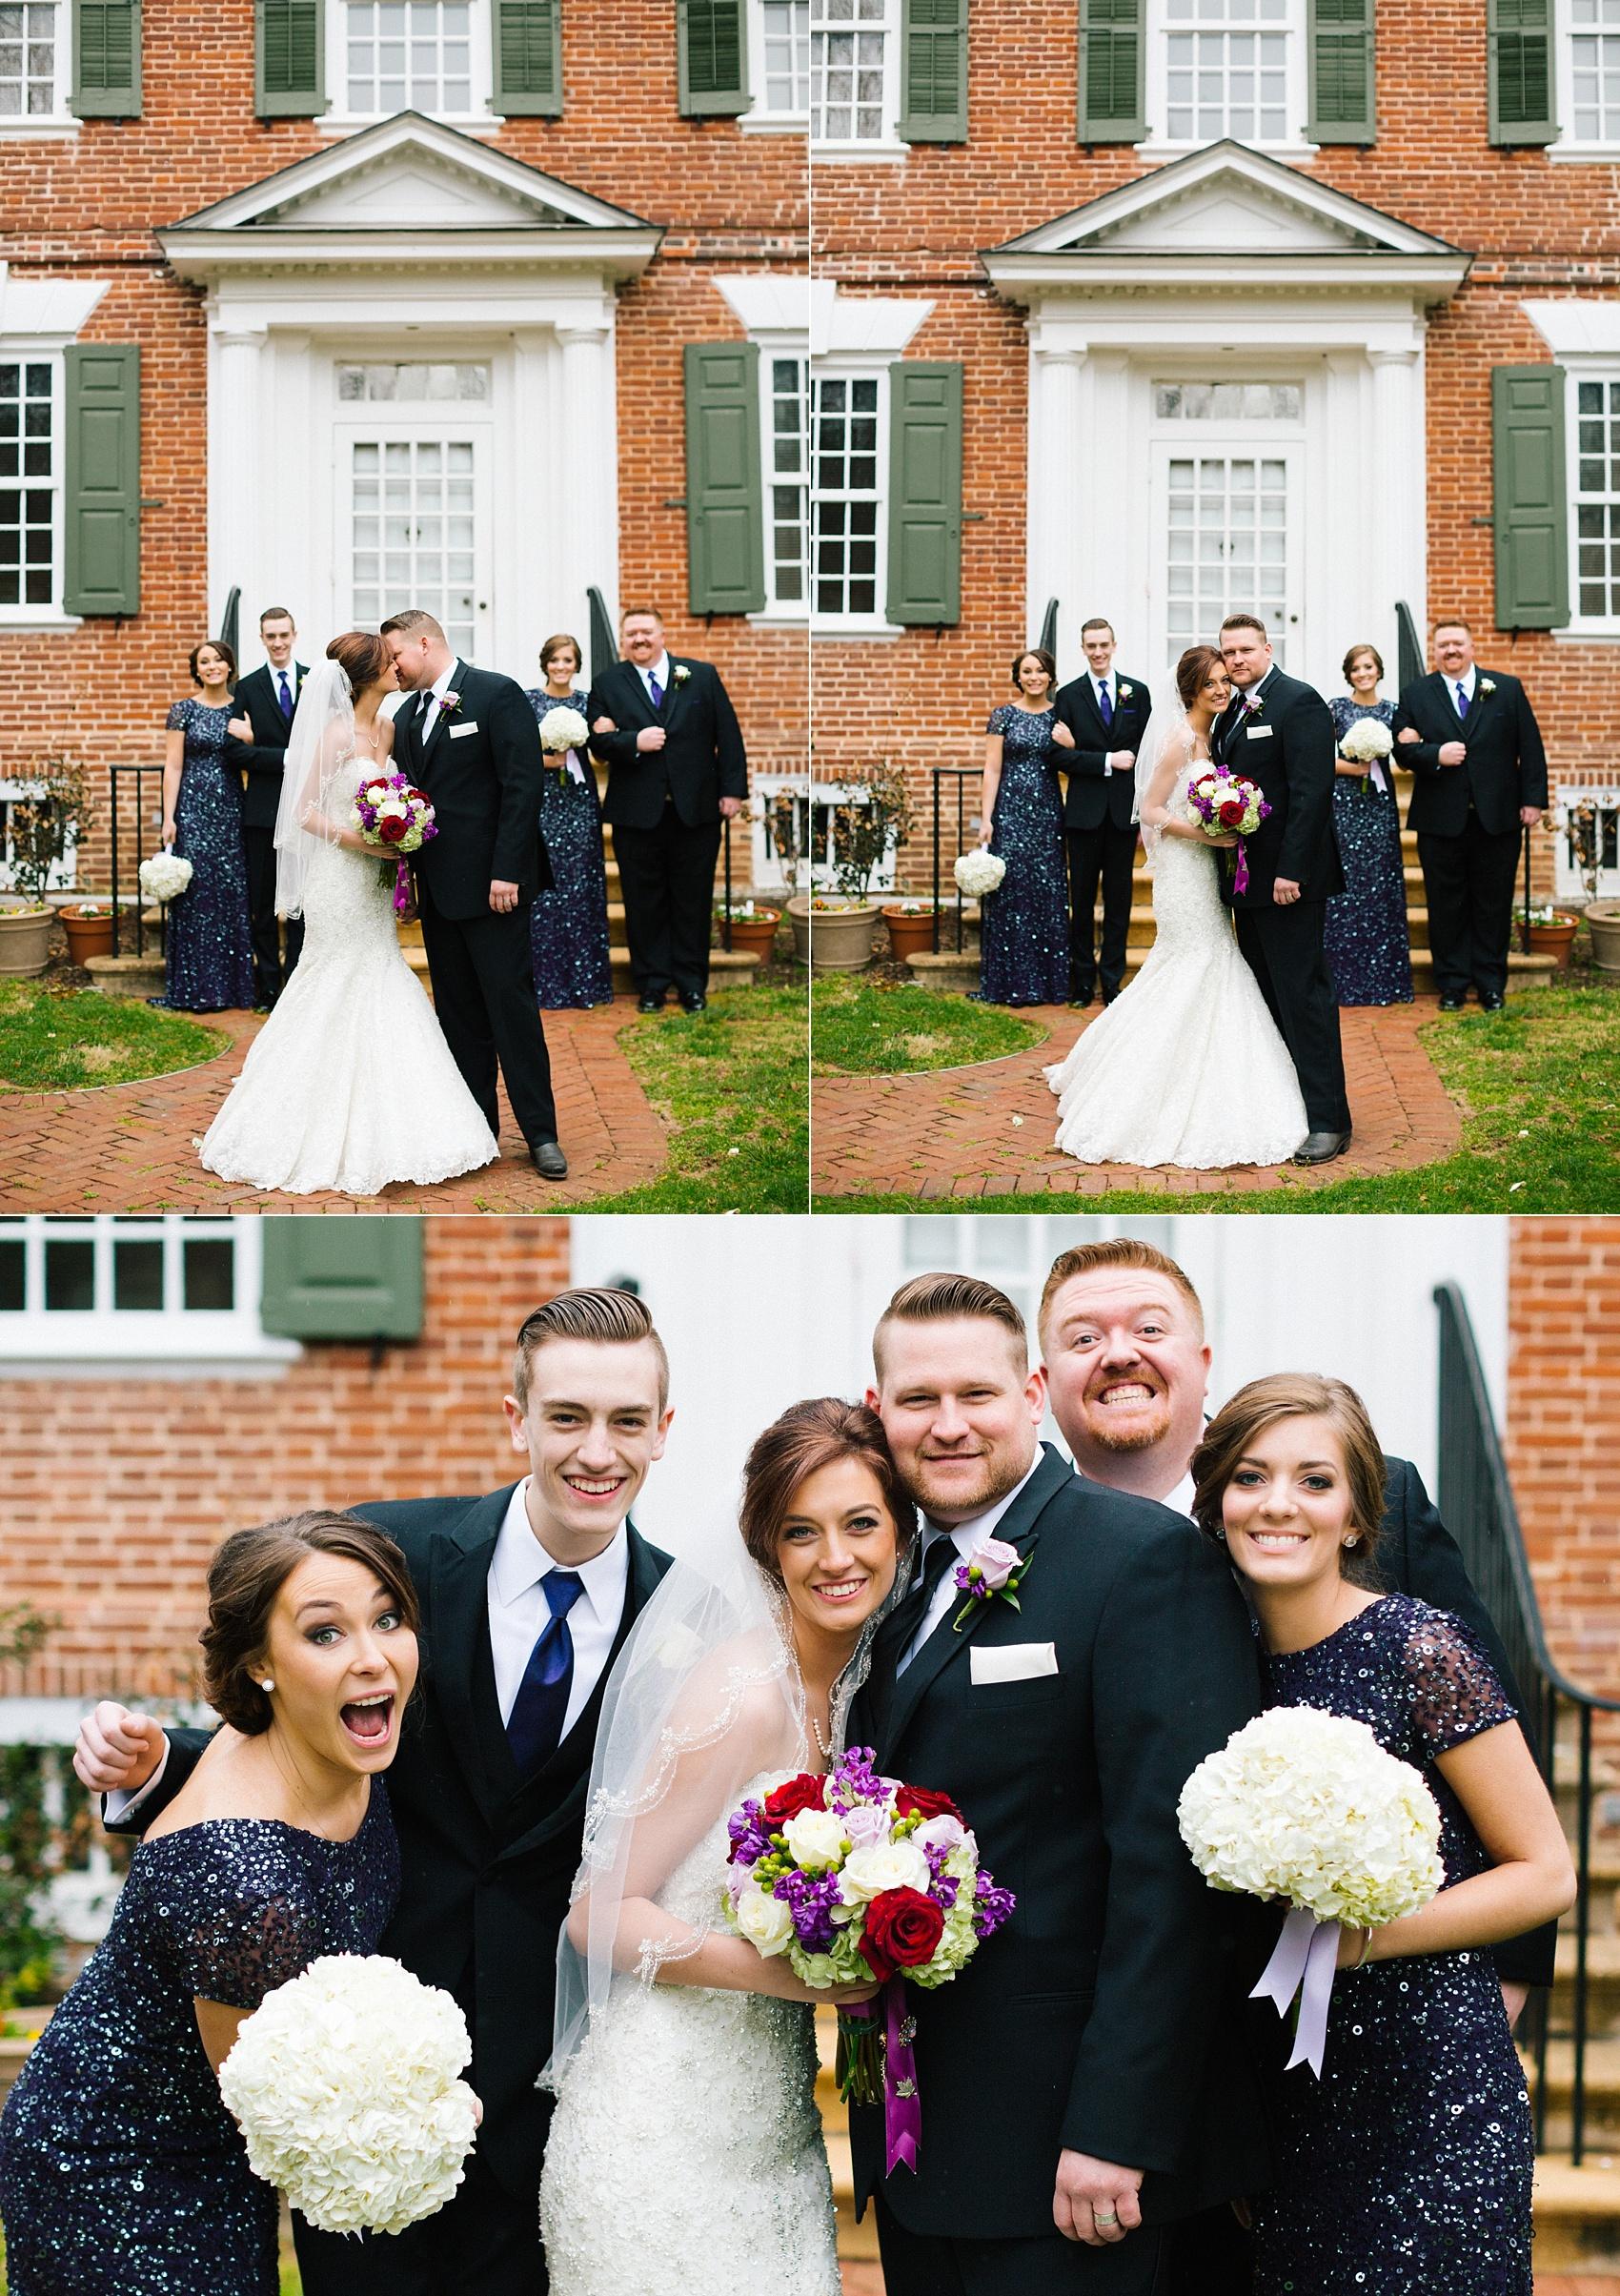 dwayne lydia delaware wedding philadelphia baltimore washingtion dc wedding photographer-18